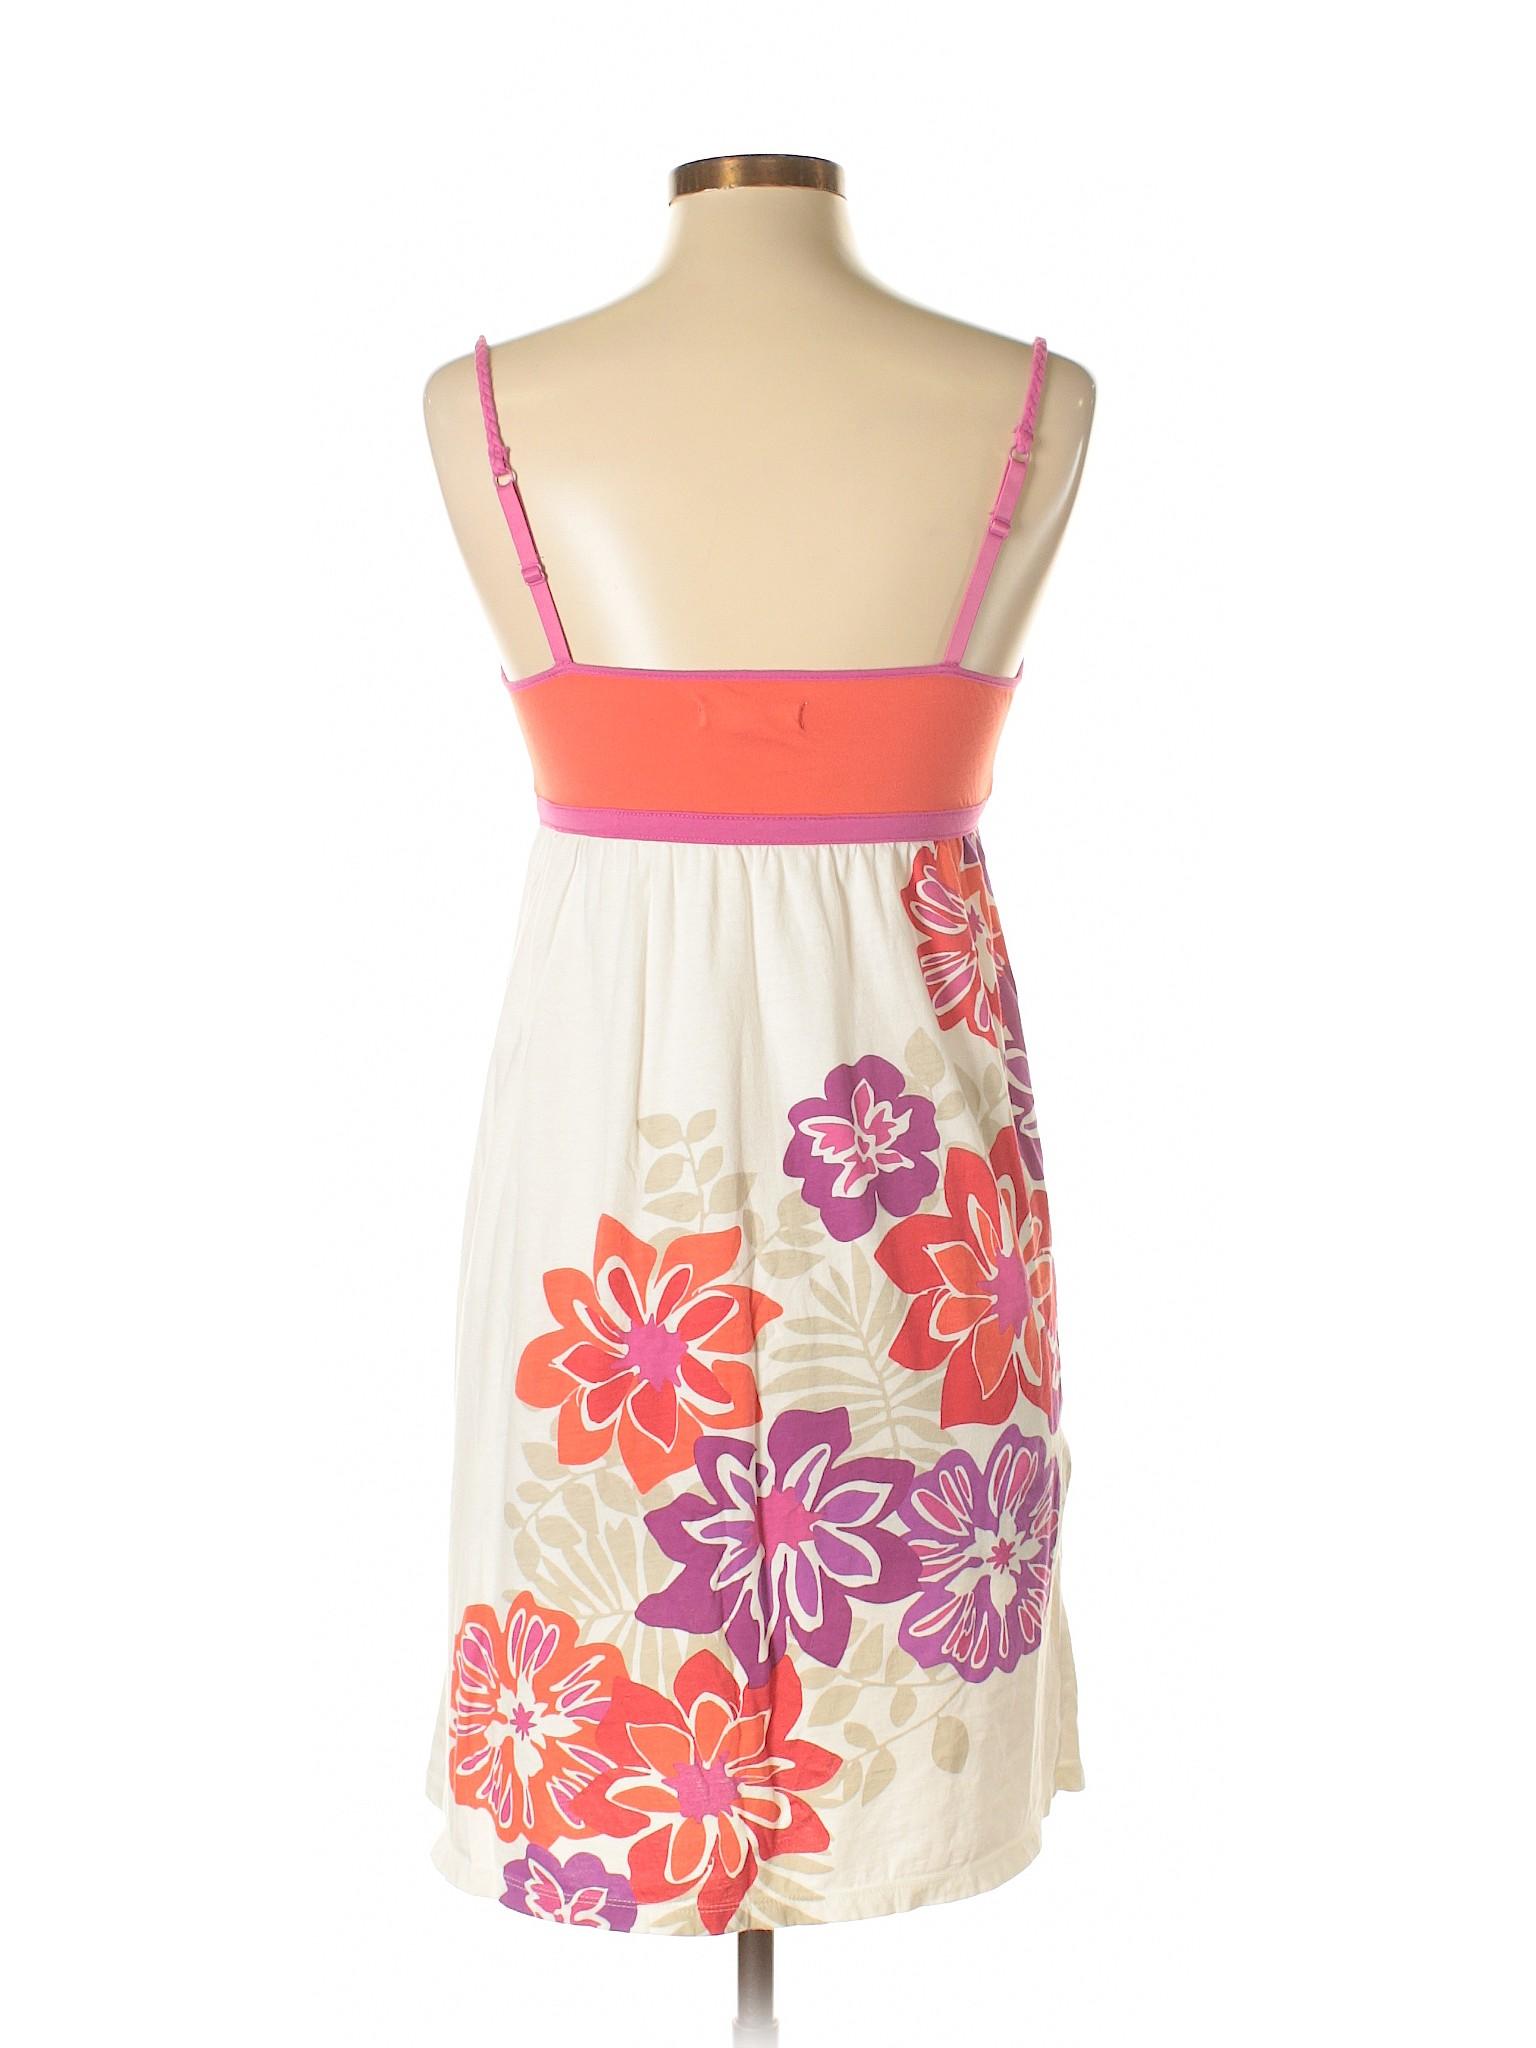 Casual Casual Dress Dress Selling Aeropostale Aeropostale Selling BxUZw